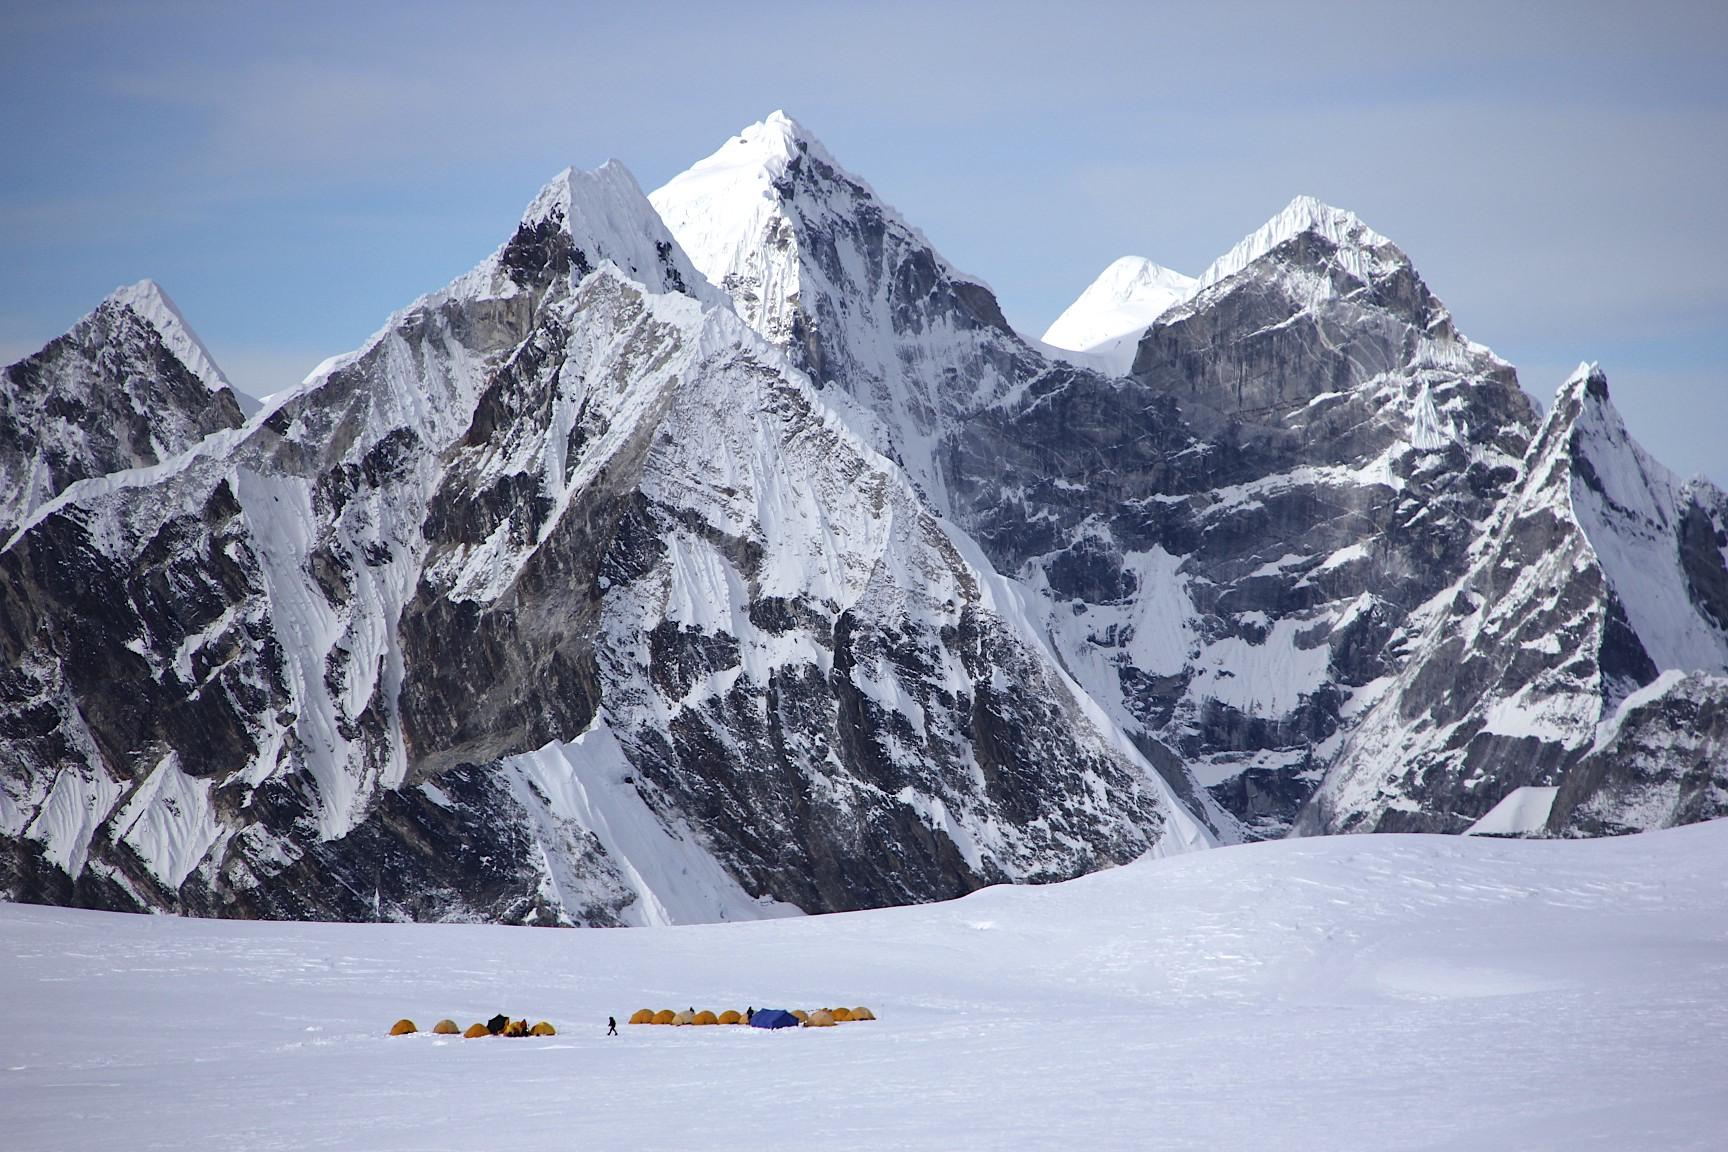 Camp 2 for the Baruntse Climb